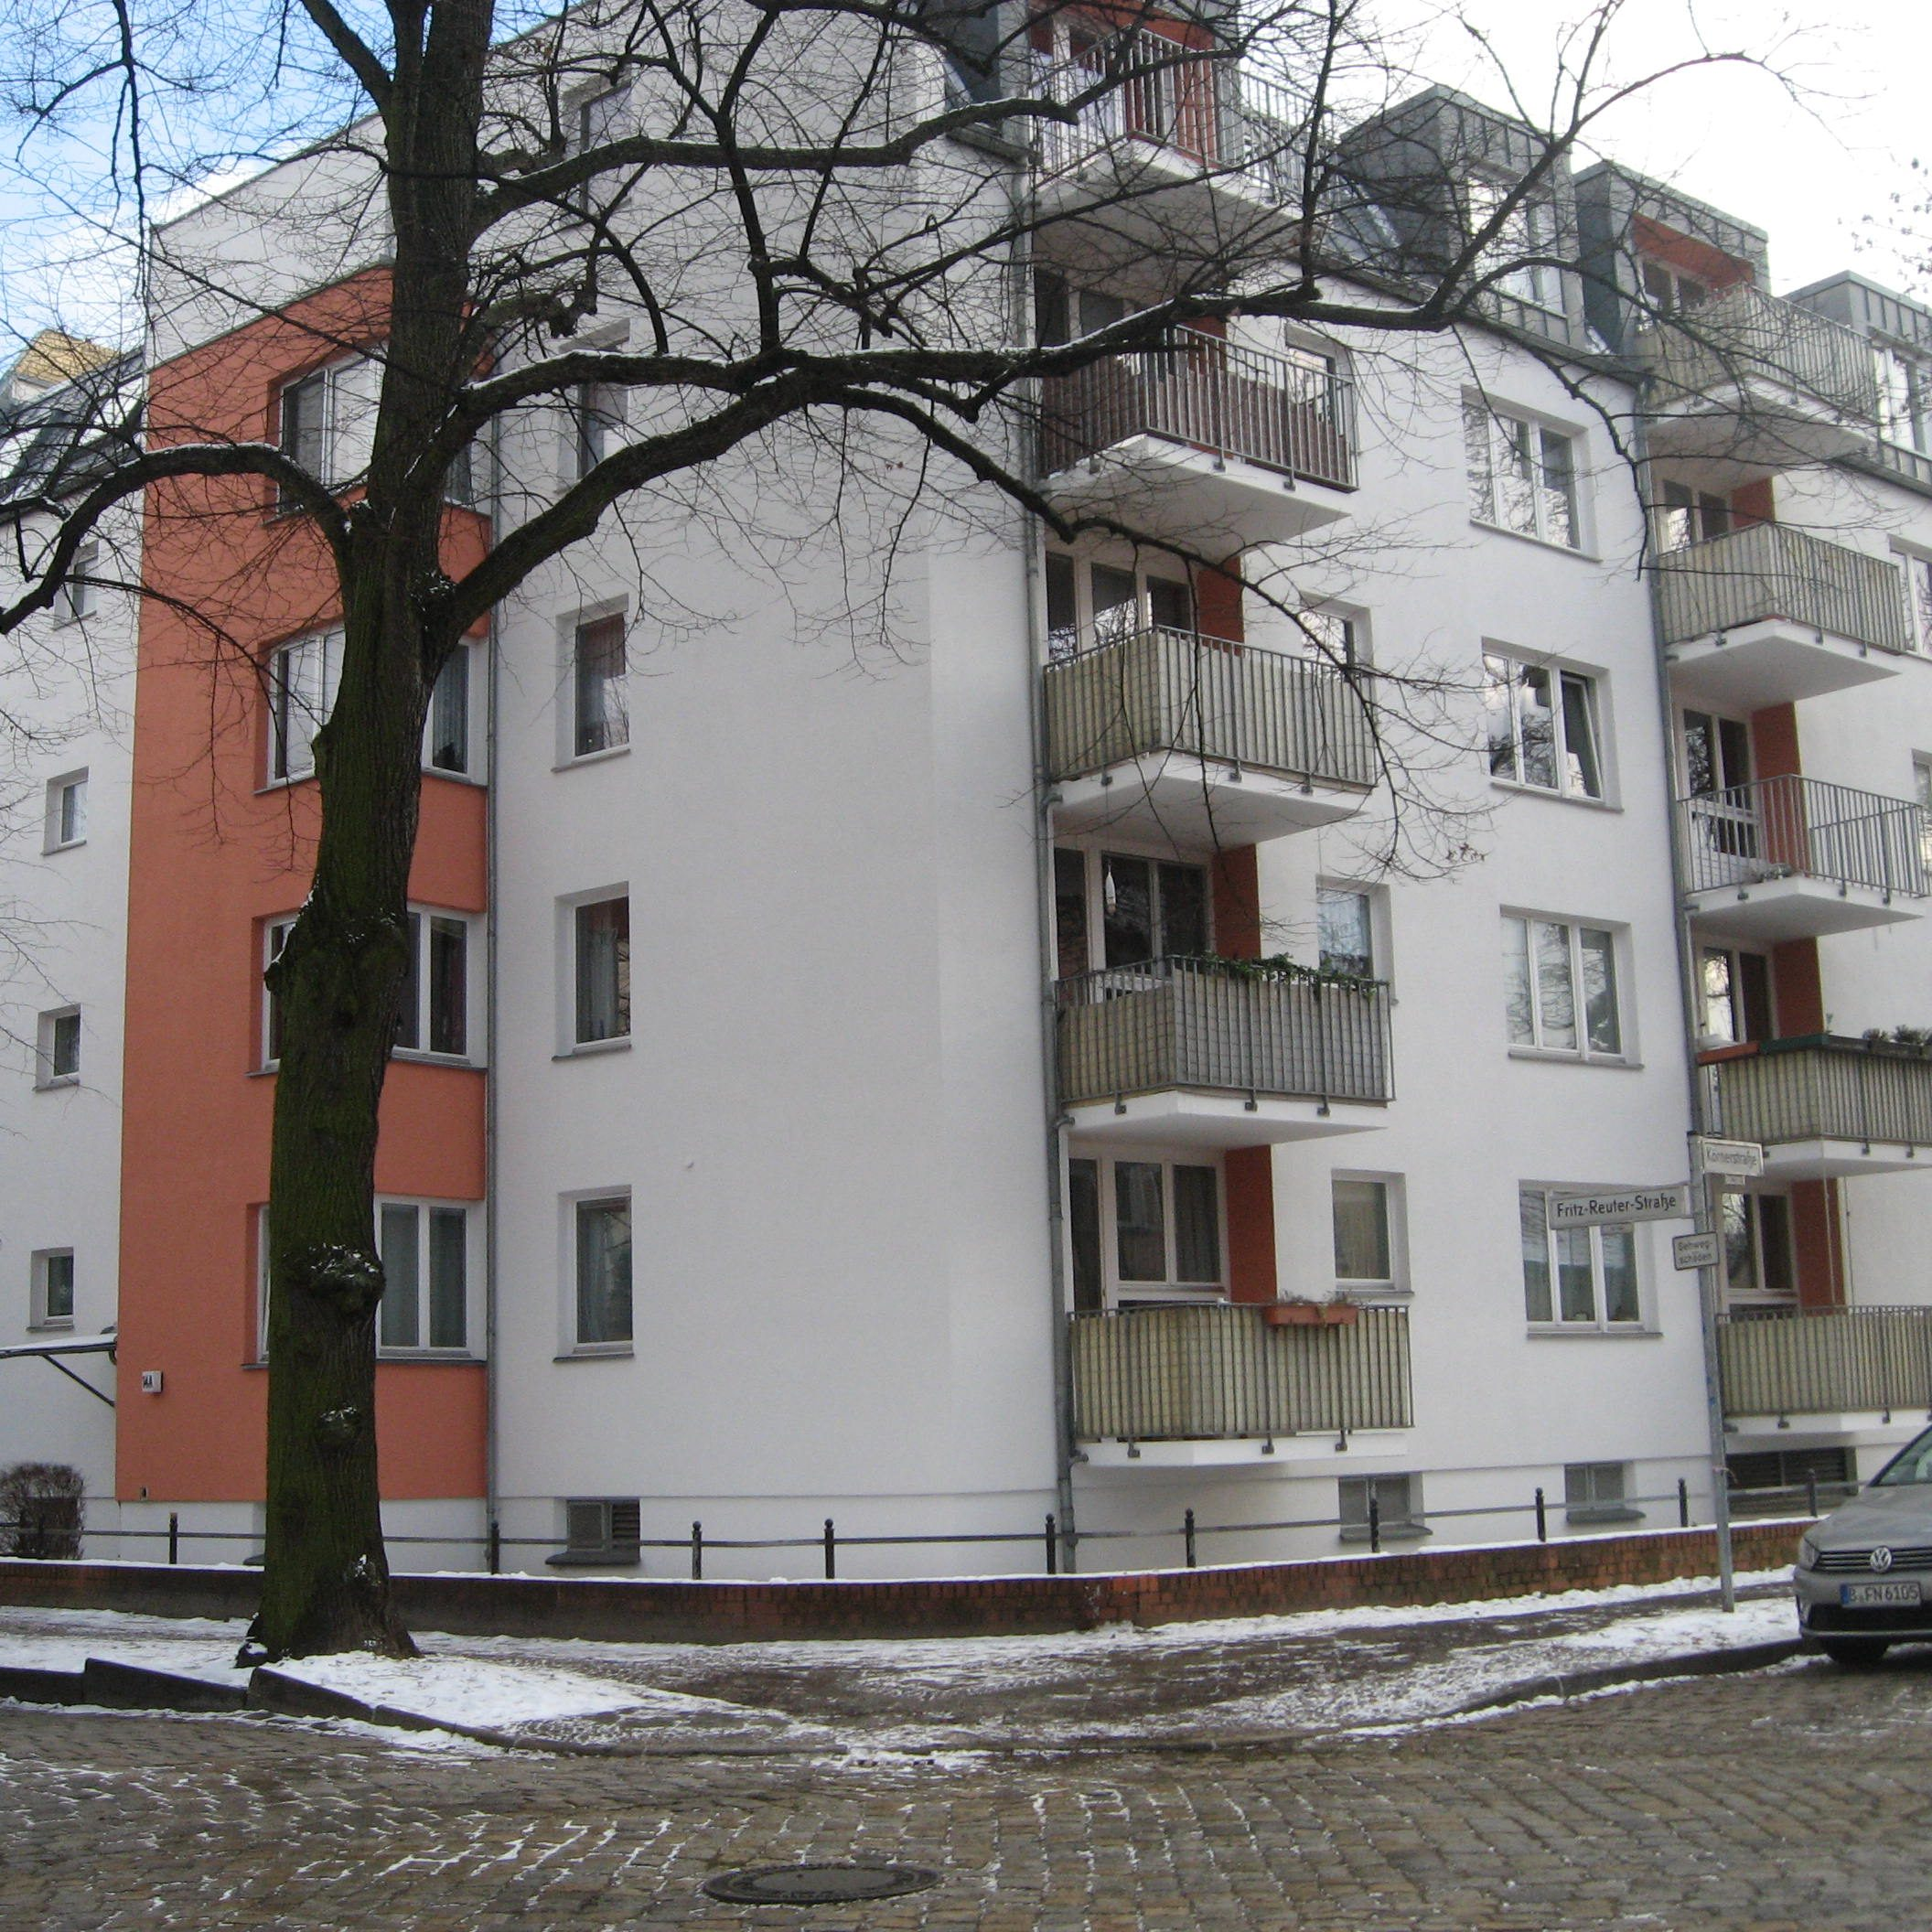 WEG Fritz-Straße, Berlin